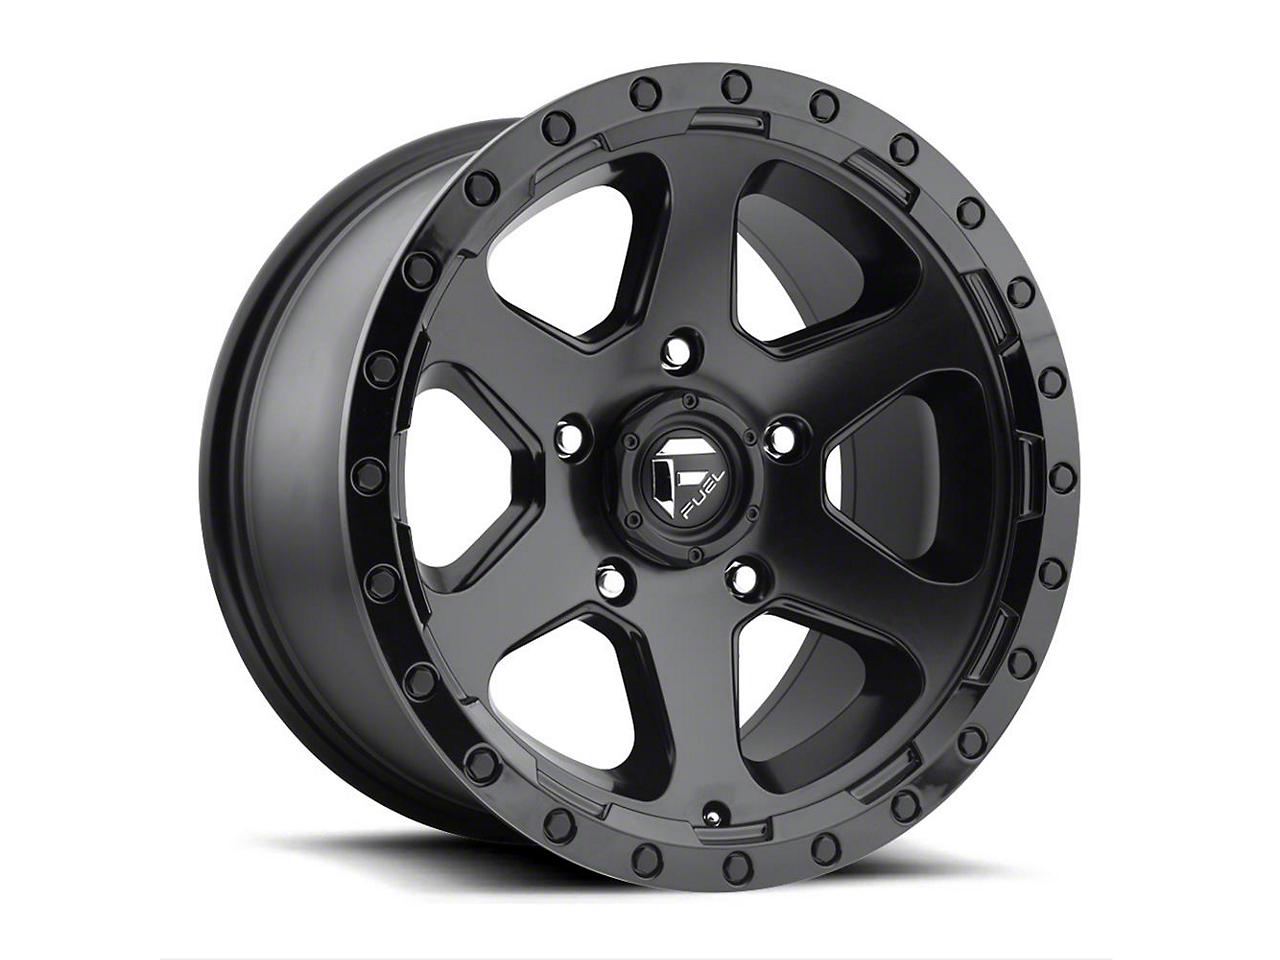 Fuel Wheels Ripper Gloss Black Milled 5-Lug Wheel - 18x9 (02-18 RAM 1500, Excluding Mega Cab)